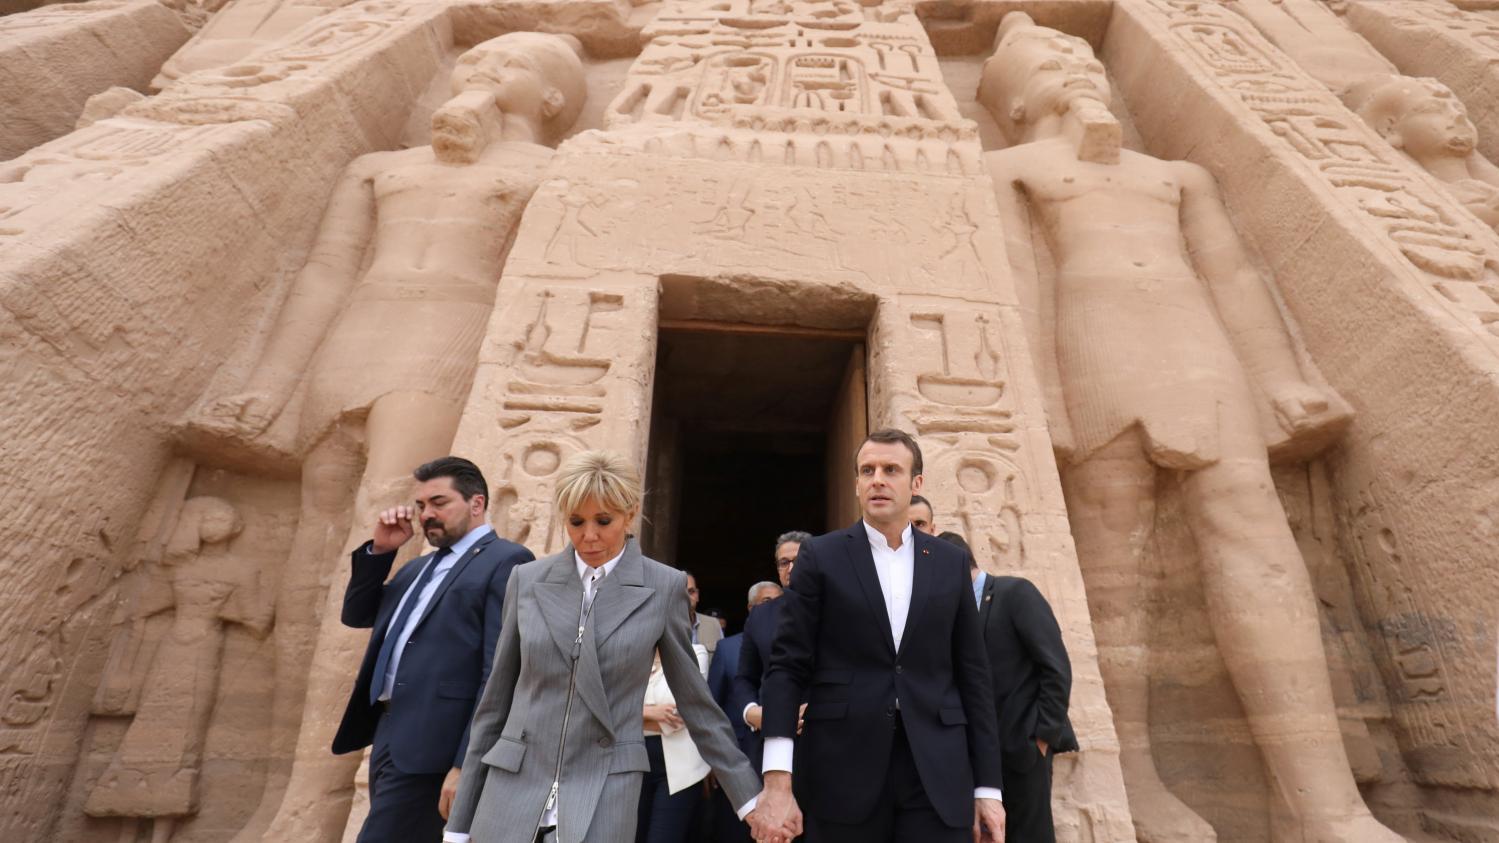 نتيجة بحث الصور عن Brigitte Macron + sneaker + Louis Vuitton